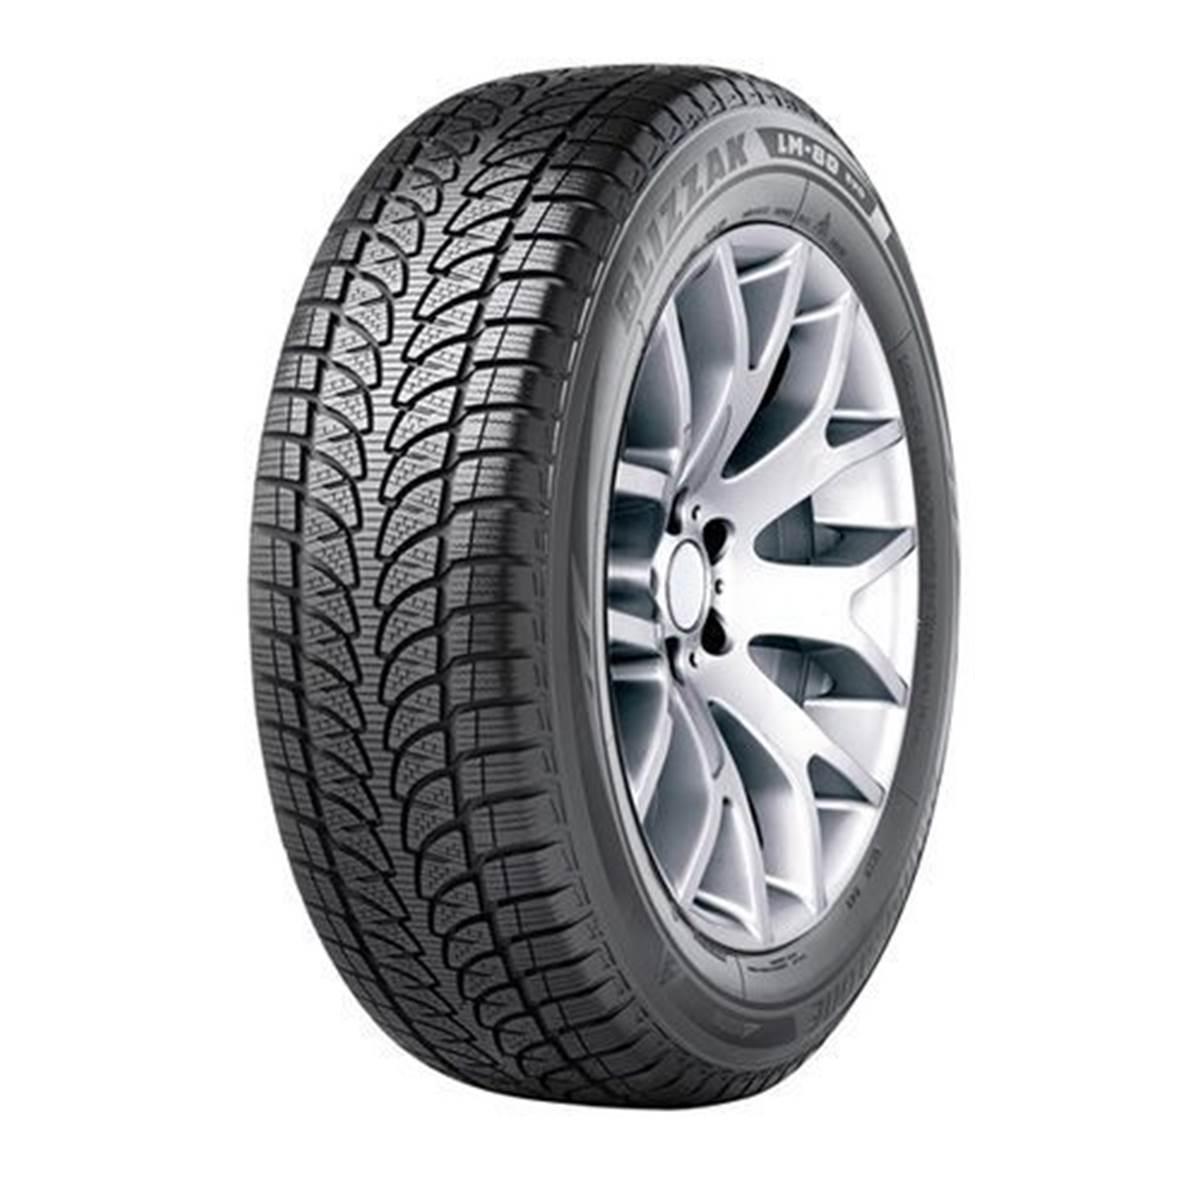 Pneu 4X4 Hiver Bridgestone 225/60R17 99H Blizzak Lm80